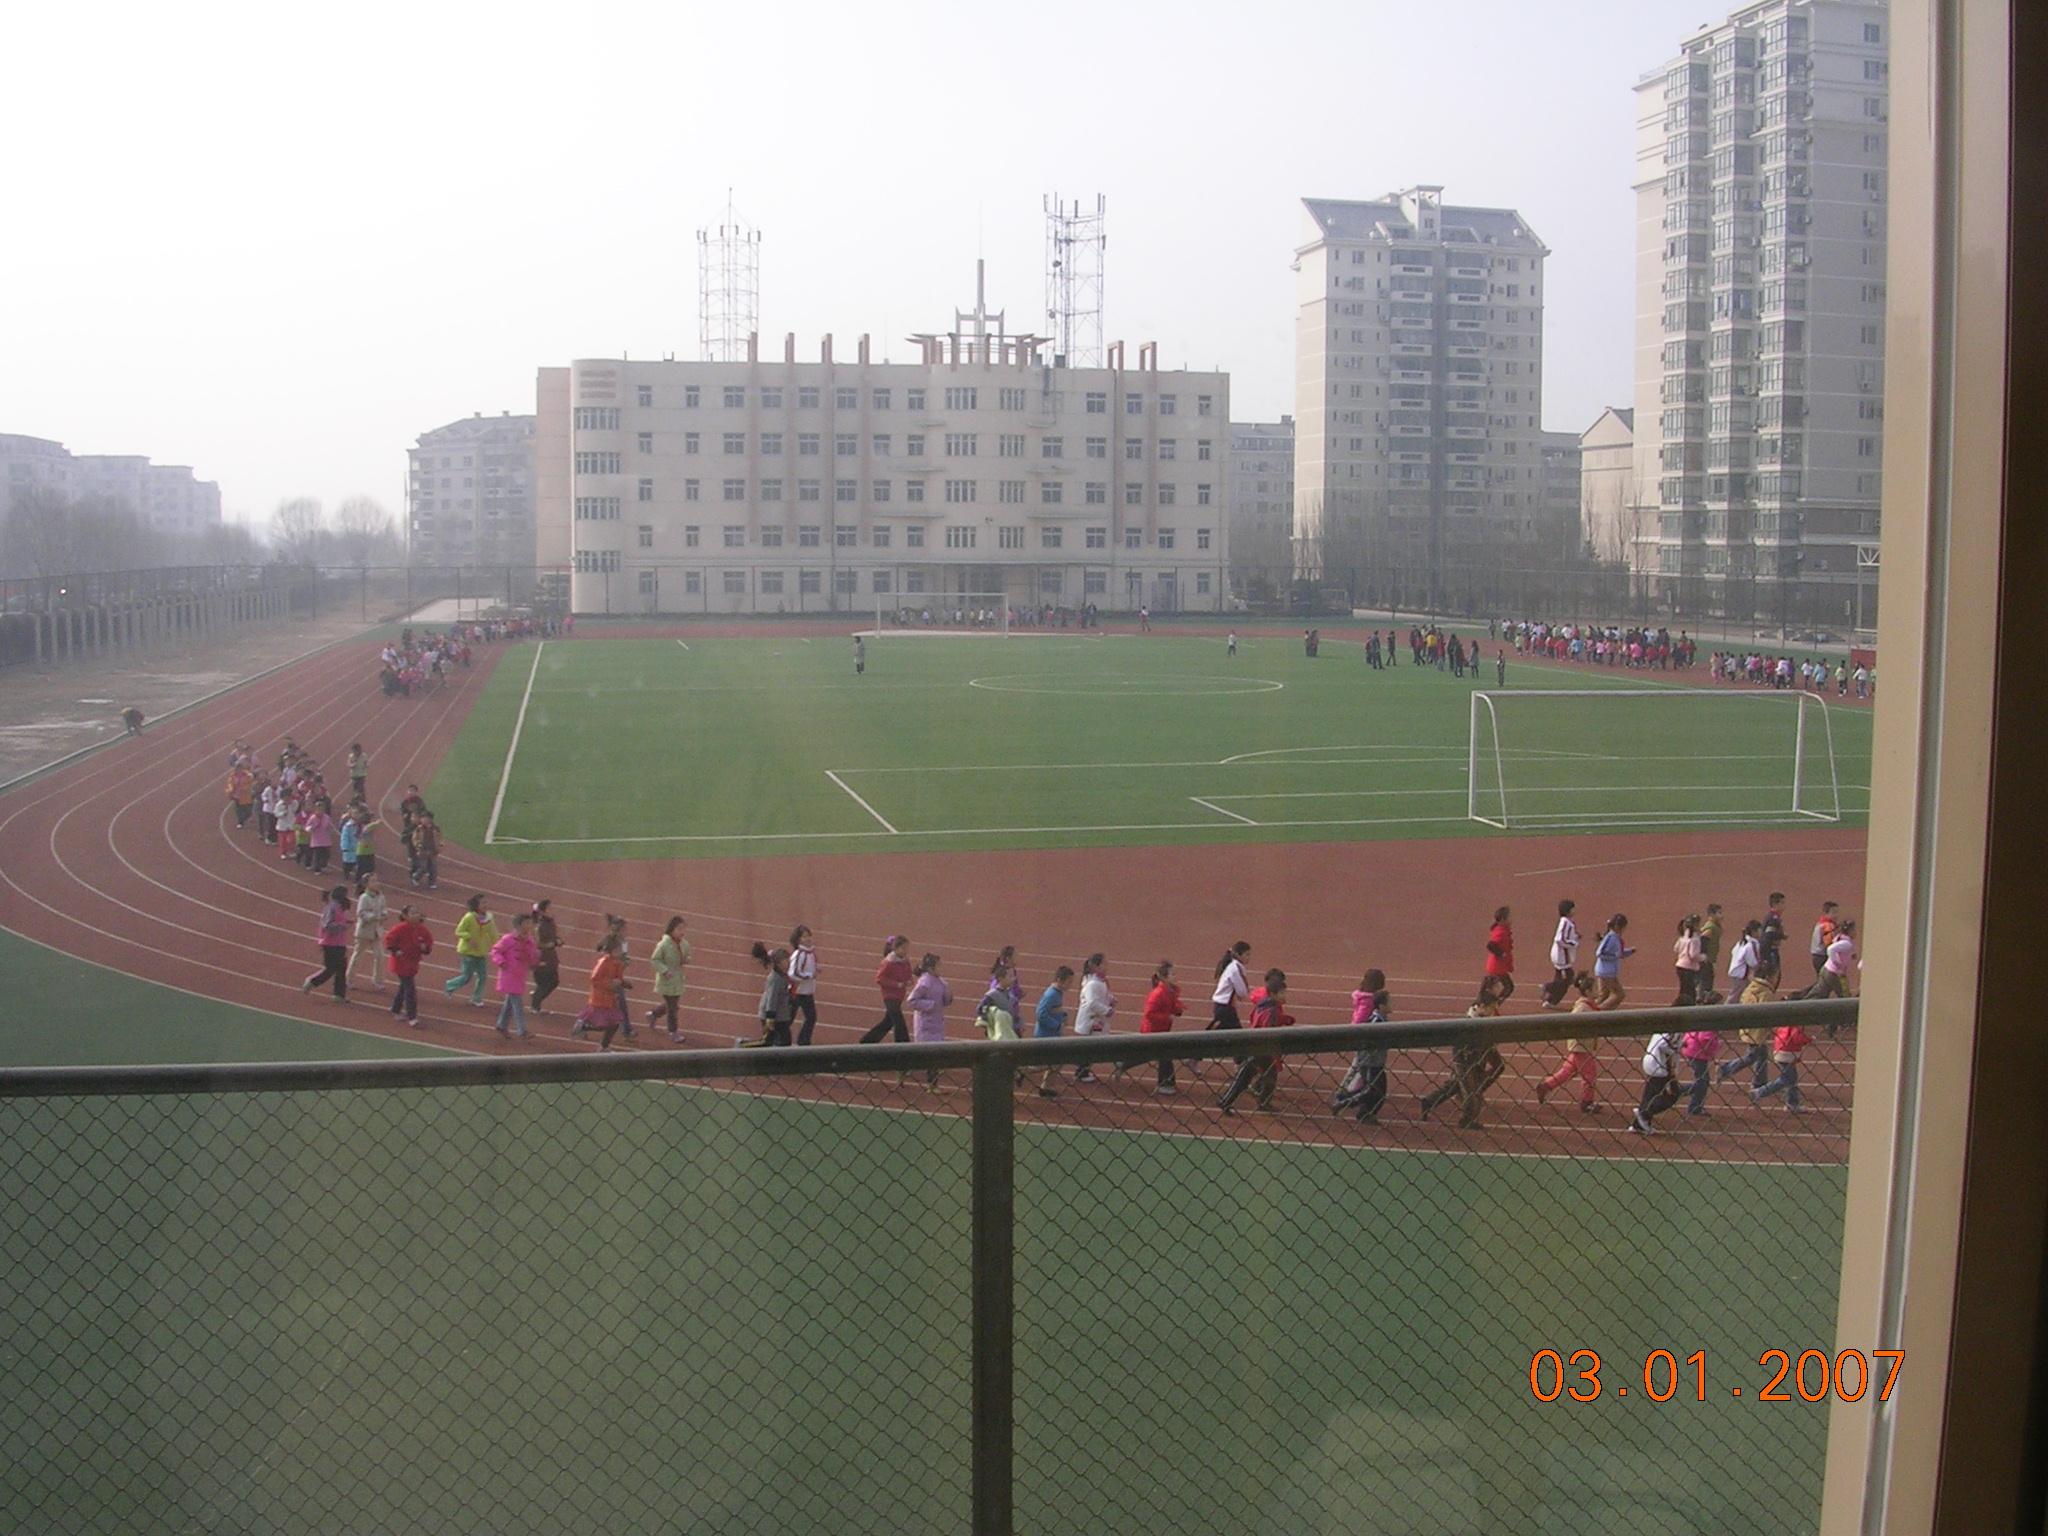 2007-3-01A 008.jpg